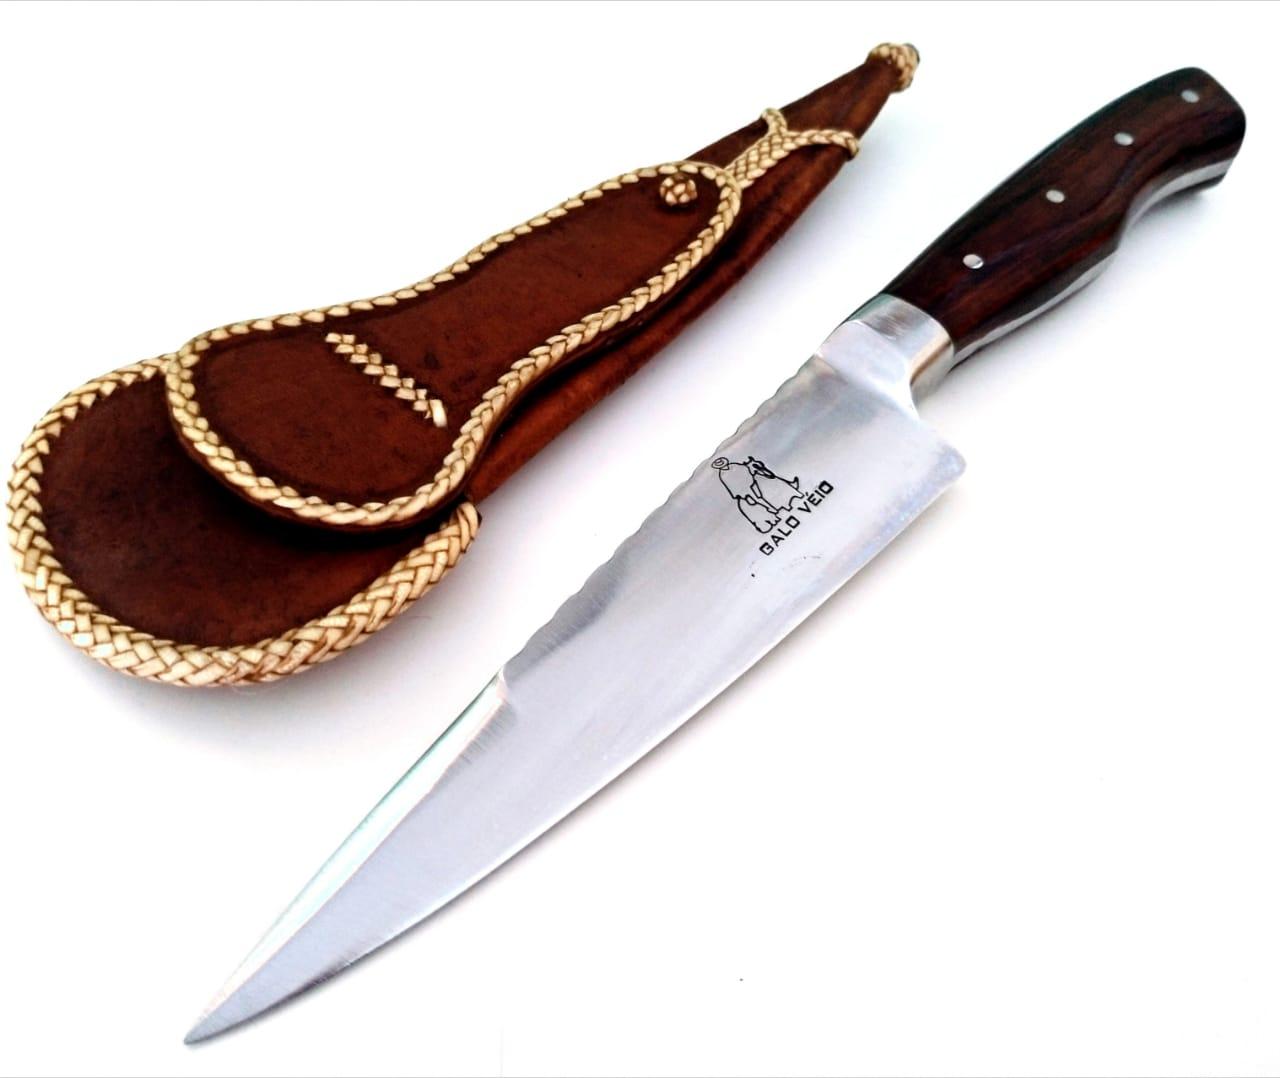 Faca artesanal forjada full tang 6 polegadas galo véio